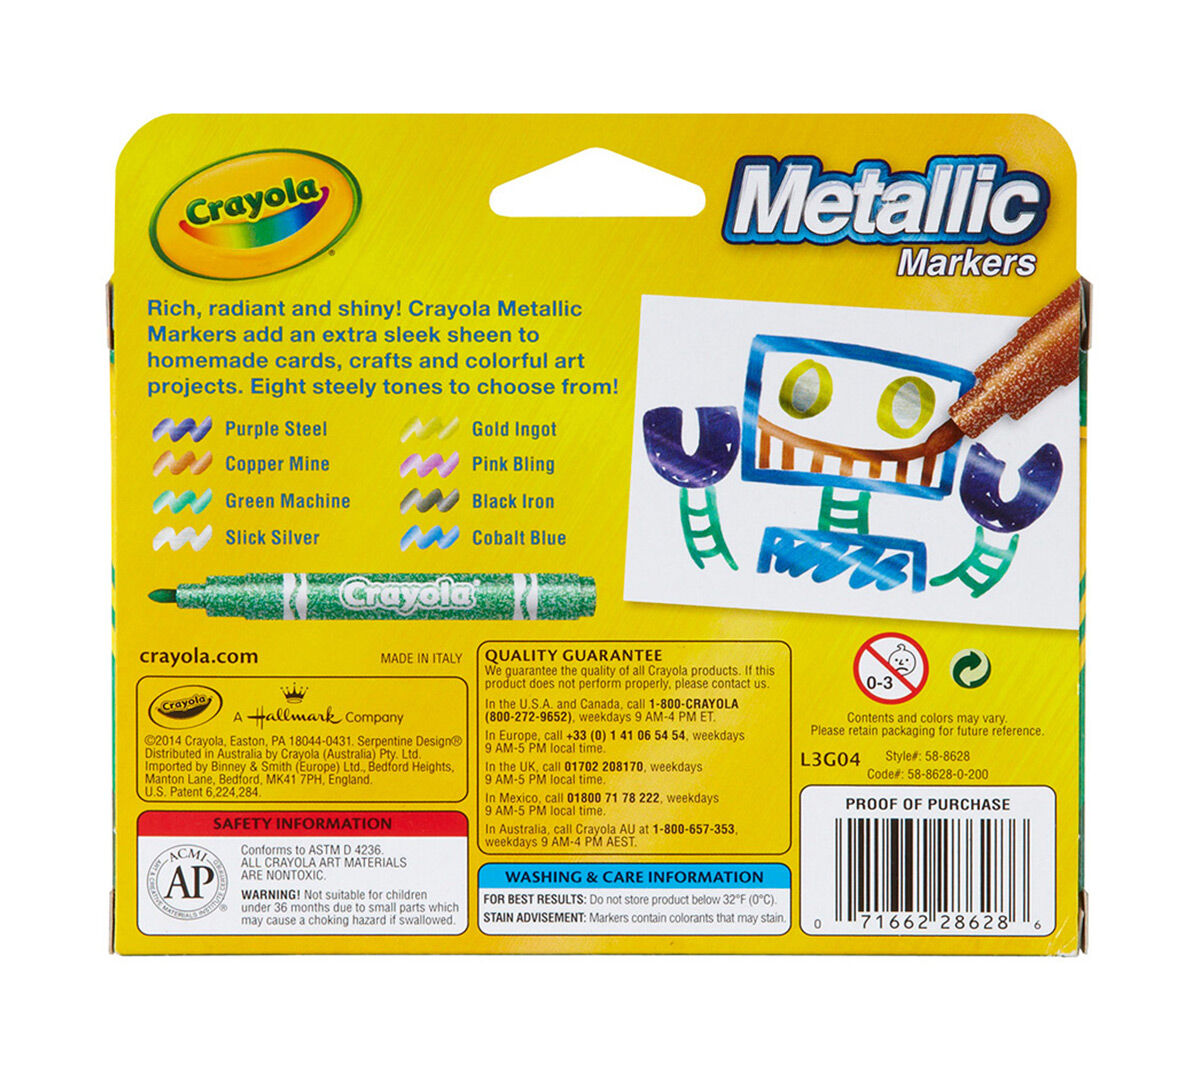 8 Count Metallic Markers Crayola